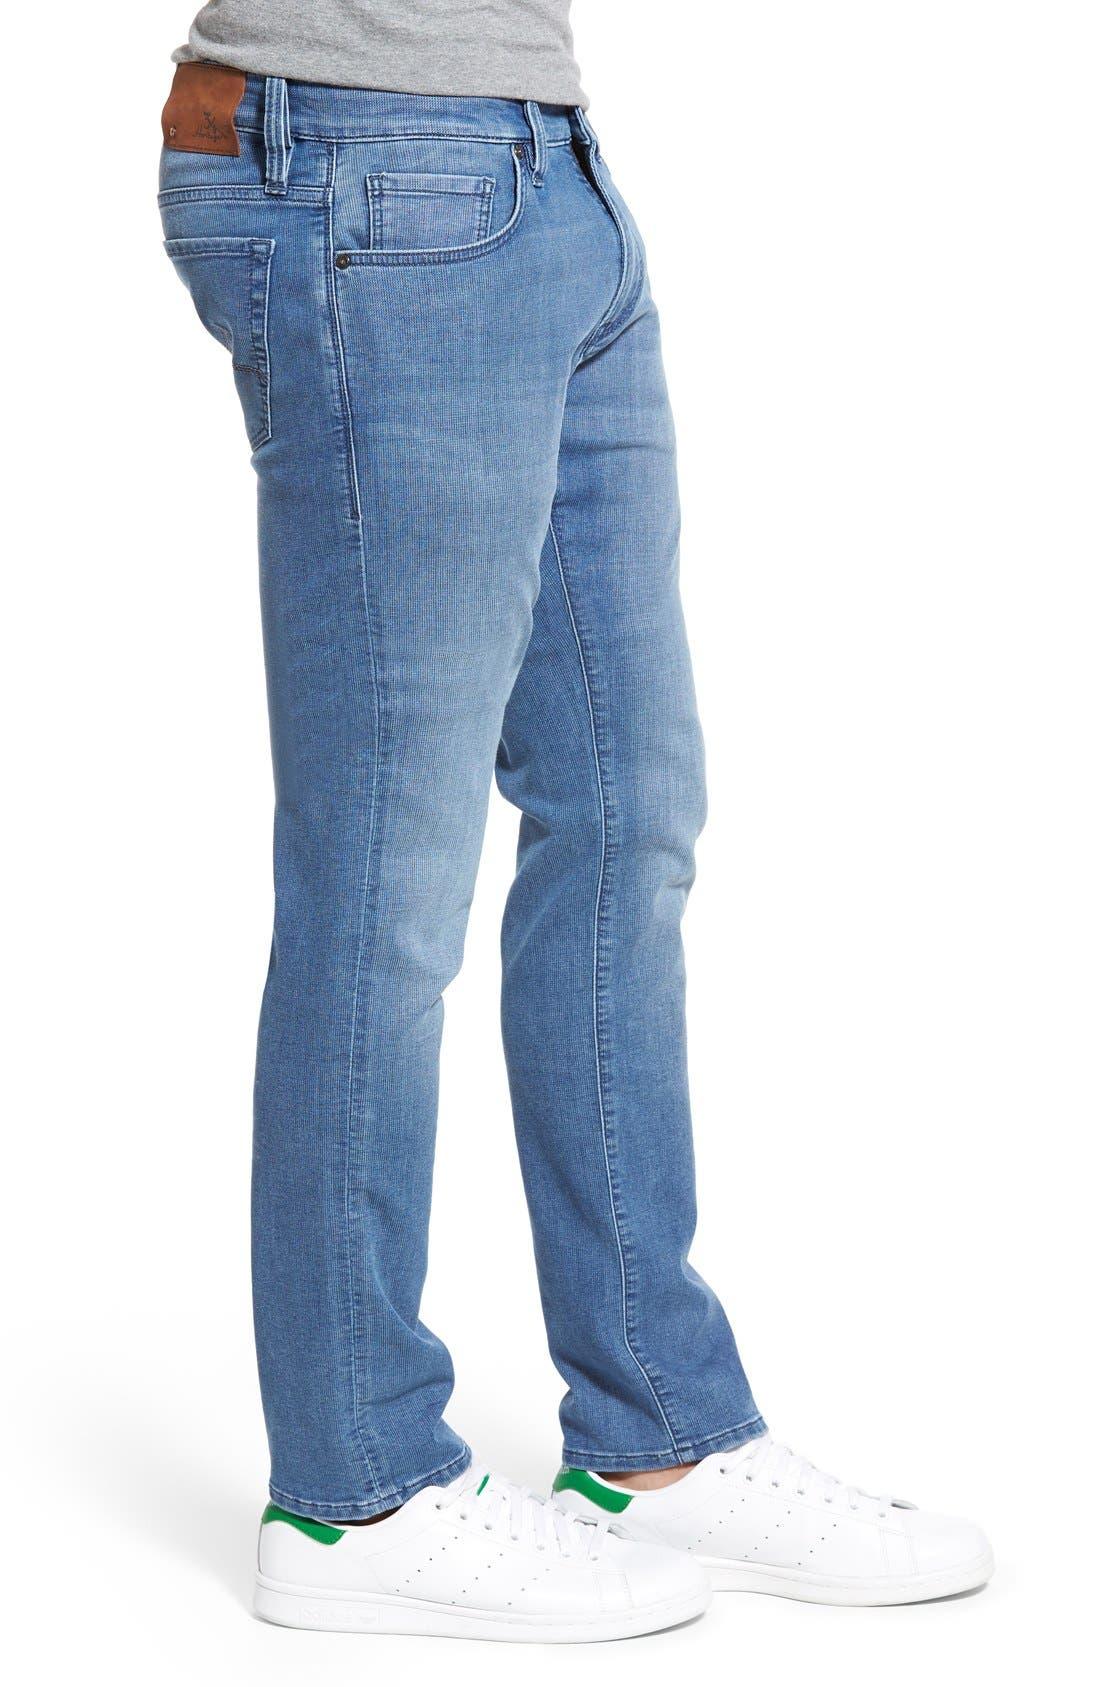 34 HERITAGE,                             'Courage' Straight Leg Jeans,                             Alternate thumbnail 4, color,                             LIGHT INDIGO SPORTY